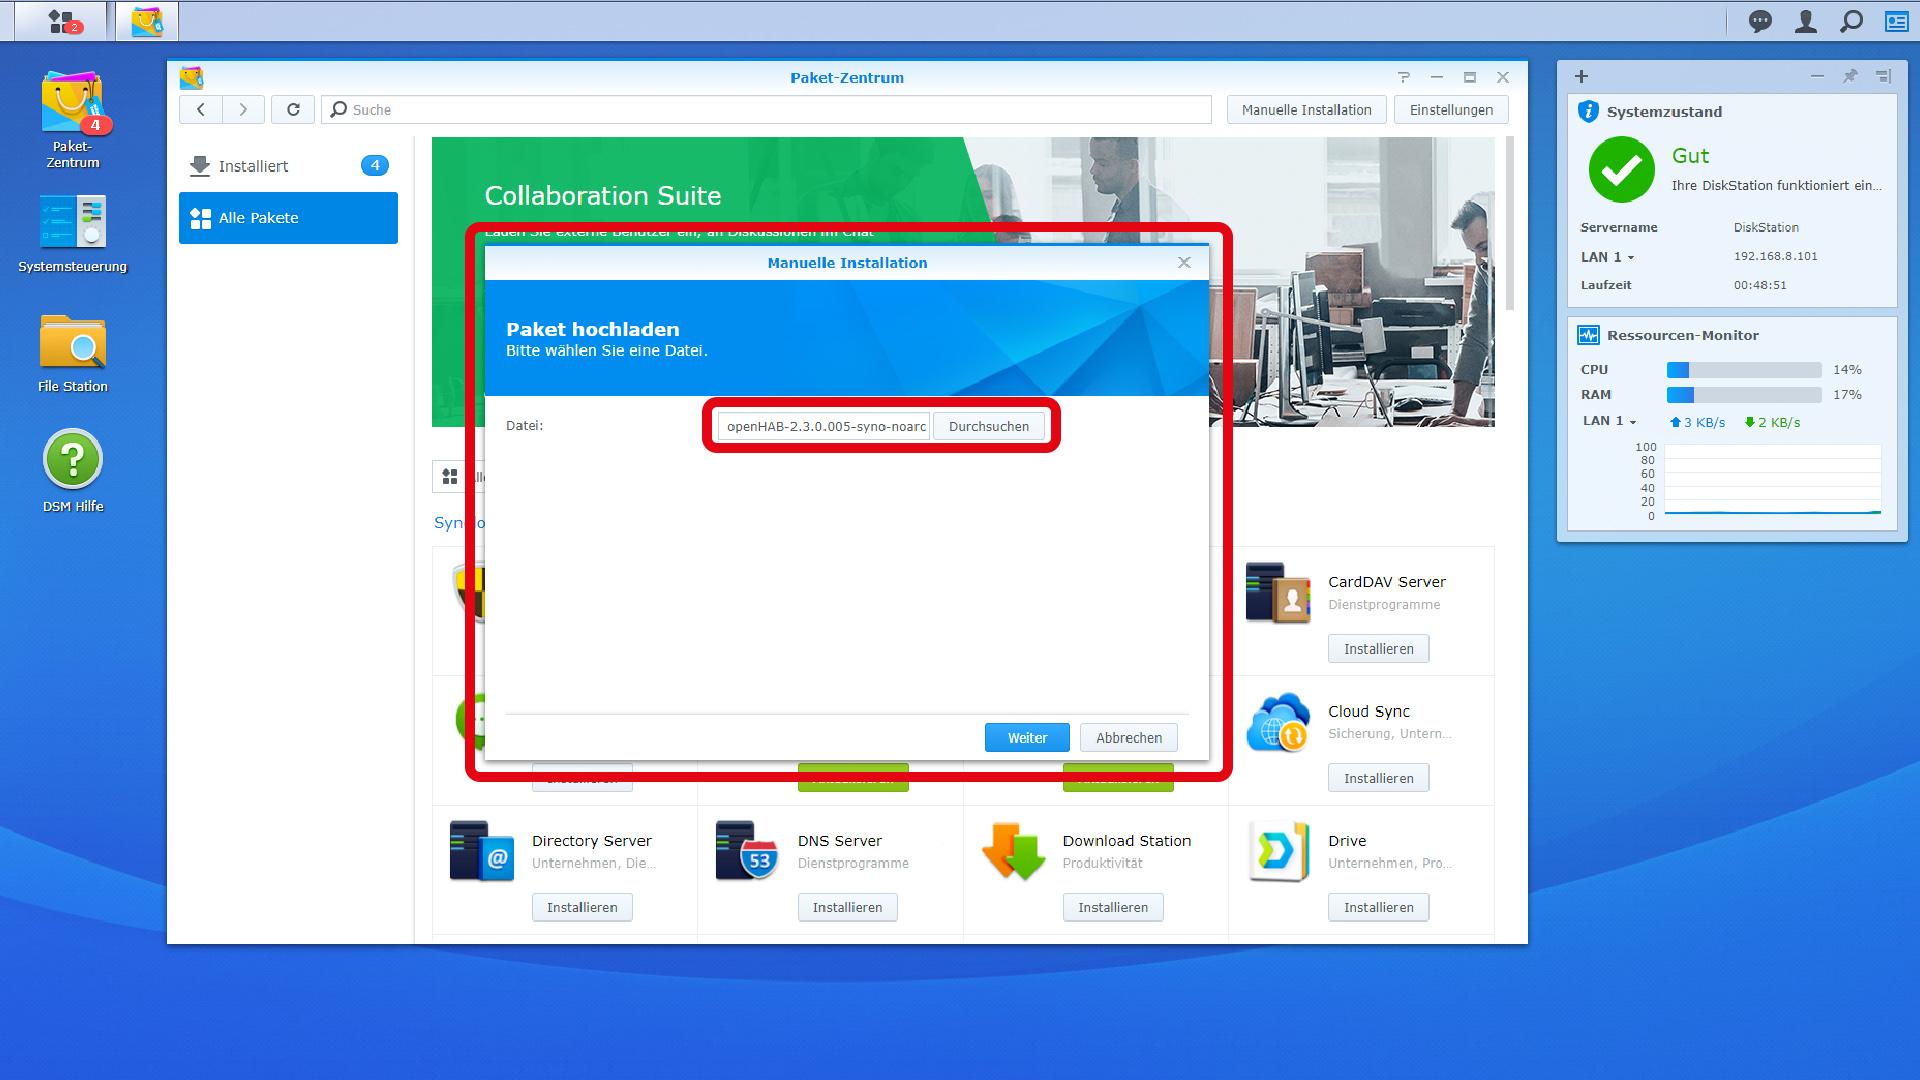 DigitaleWelt openHAB 2 - Manuelle Installation - spk Datei auswählen